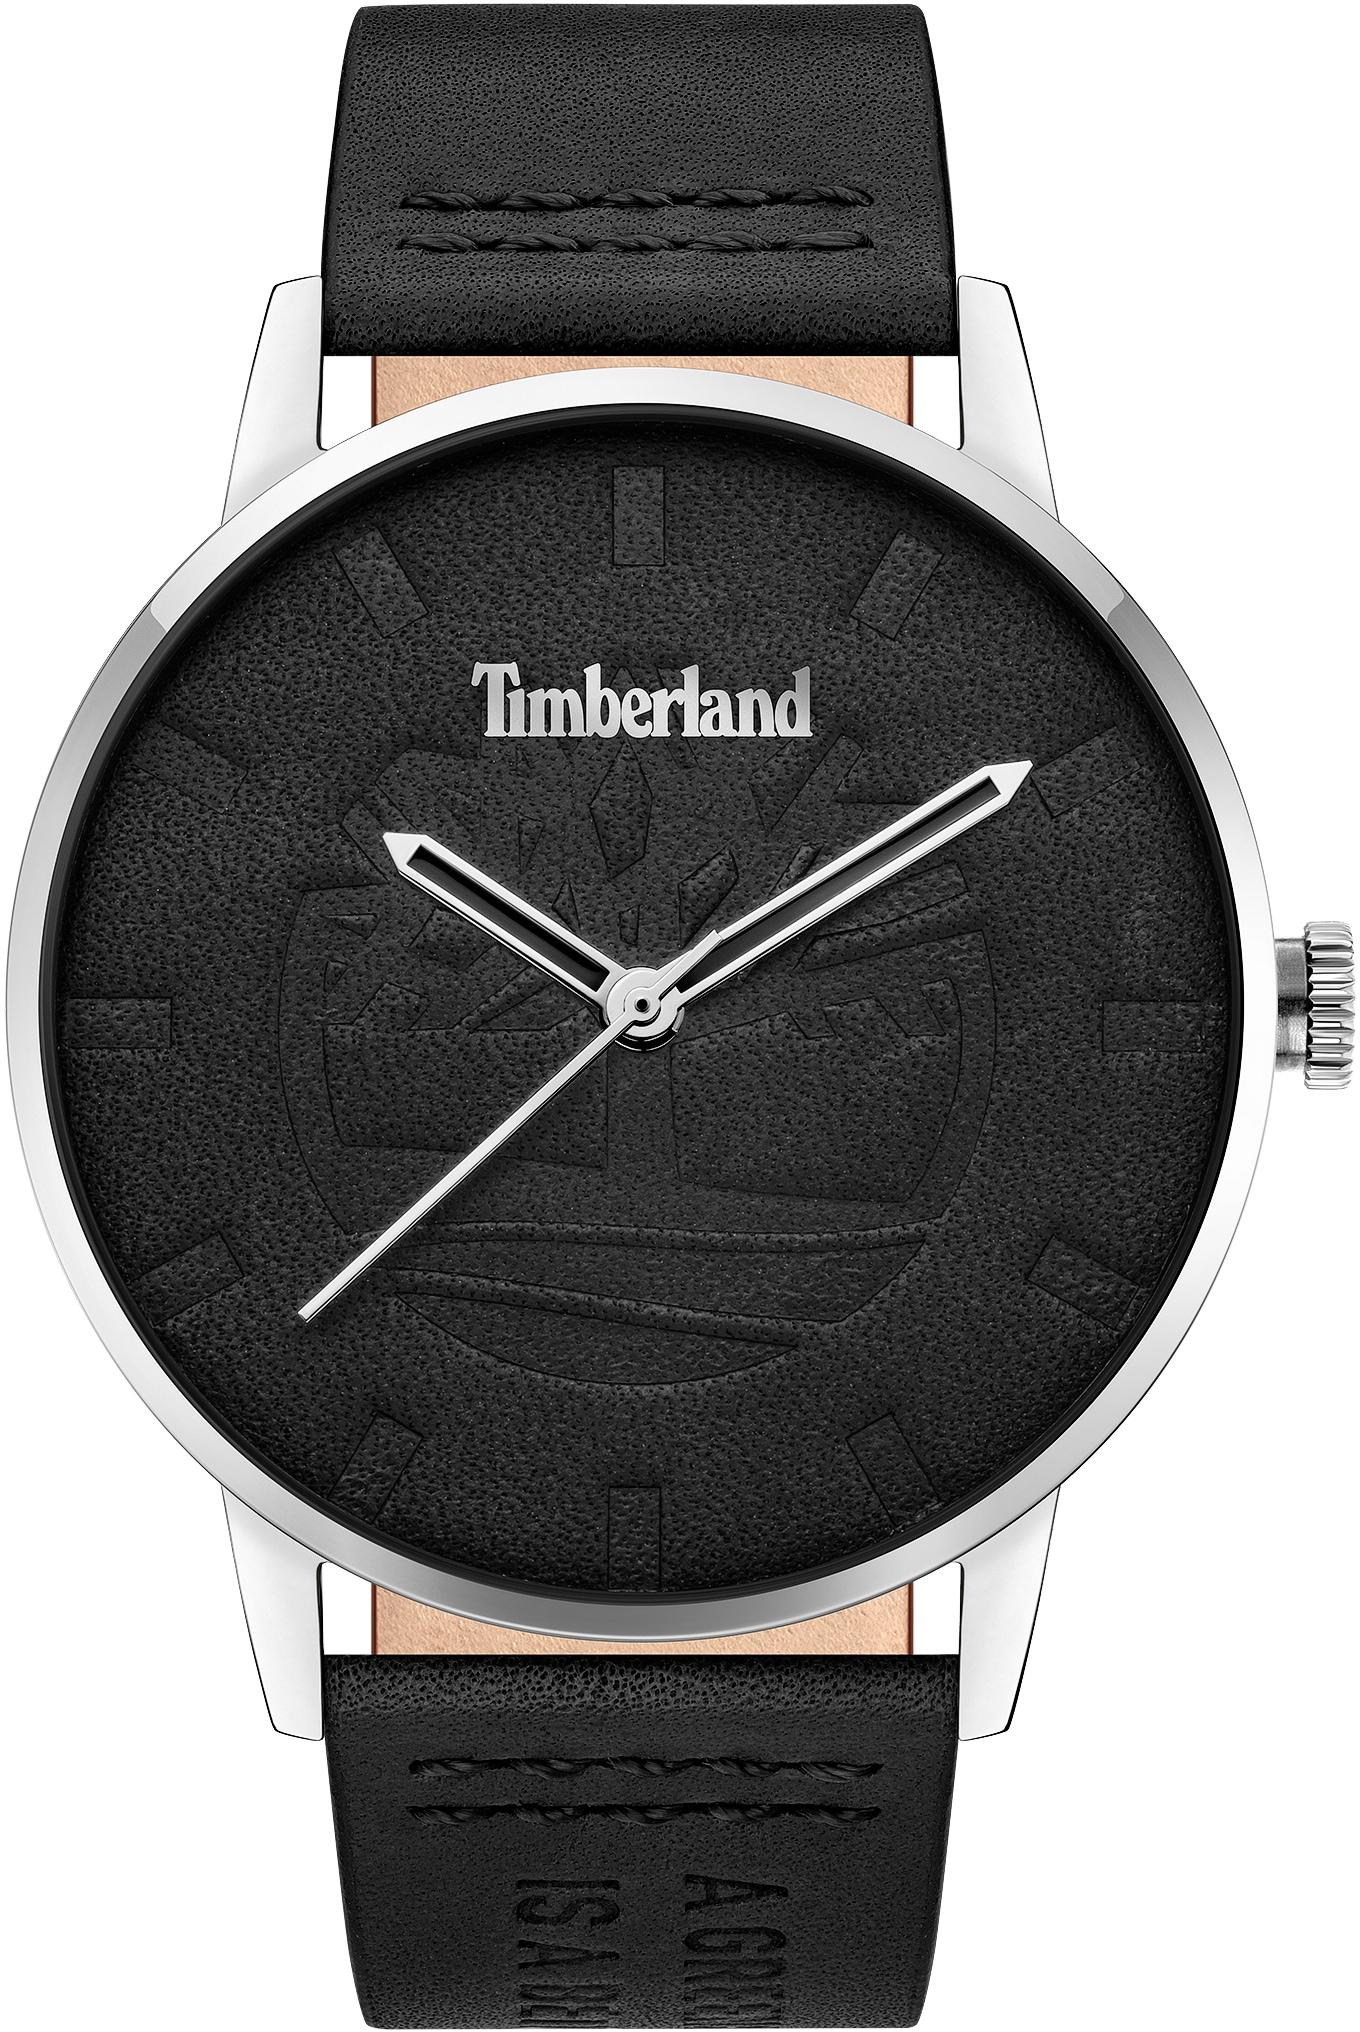 timberland -  Quarzuhr RAYCROFT, TDWJA2000802